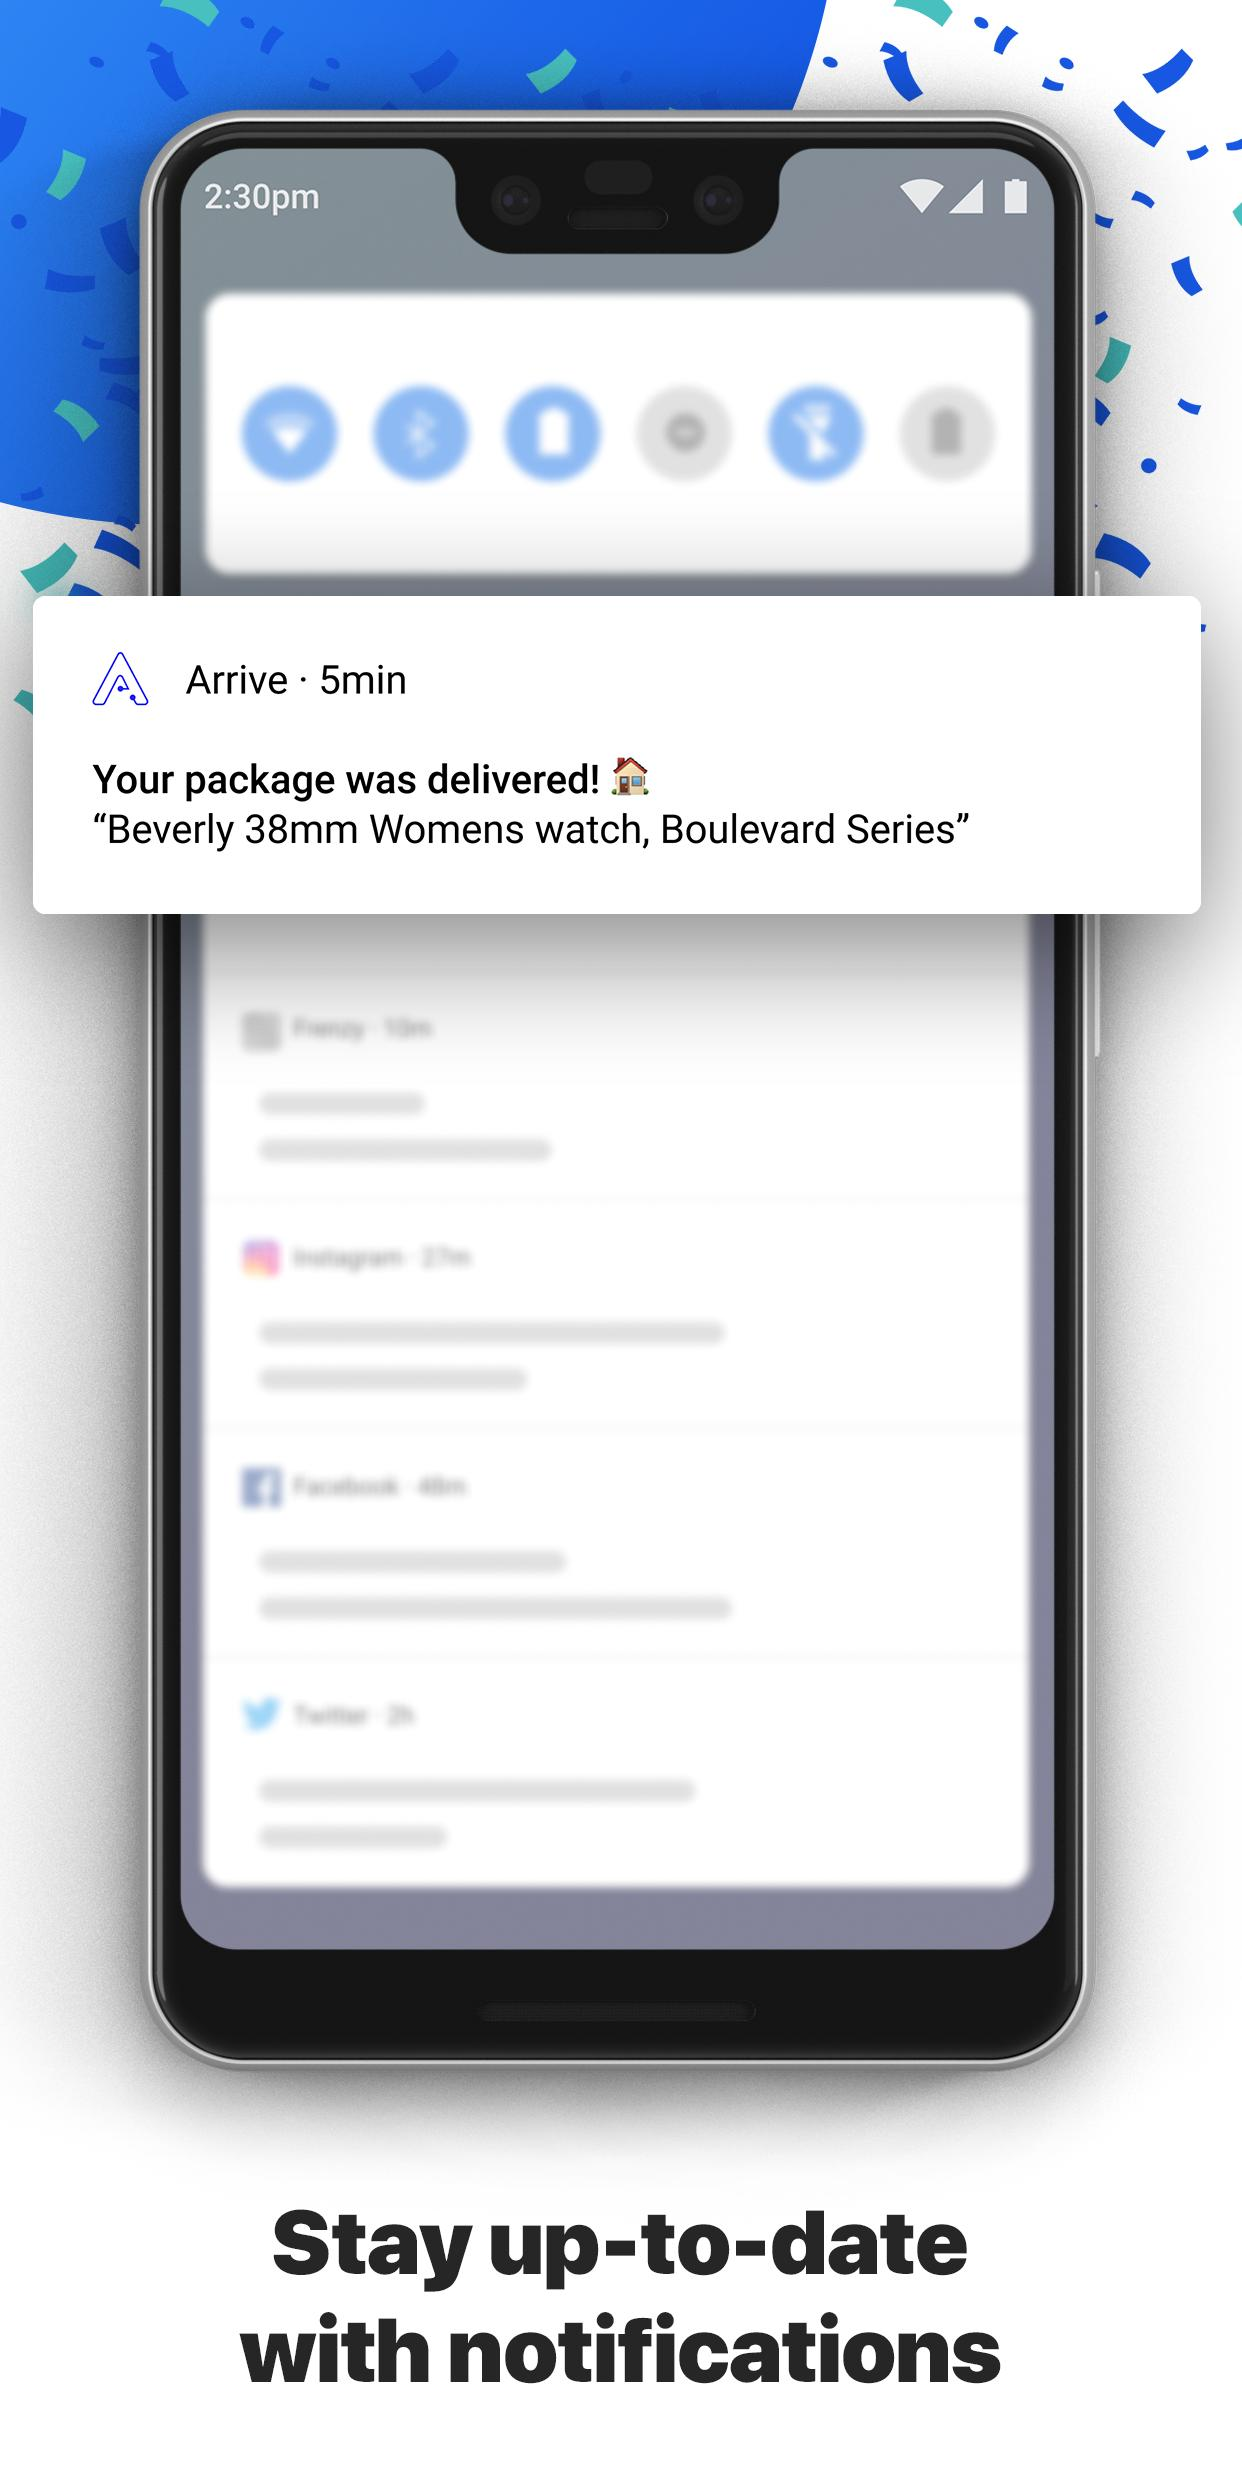 Arrive Package Tracker 1.6.0 Screenshot 4